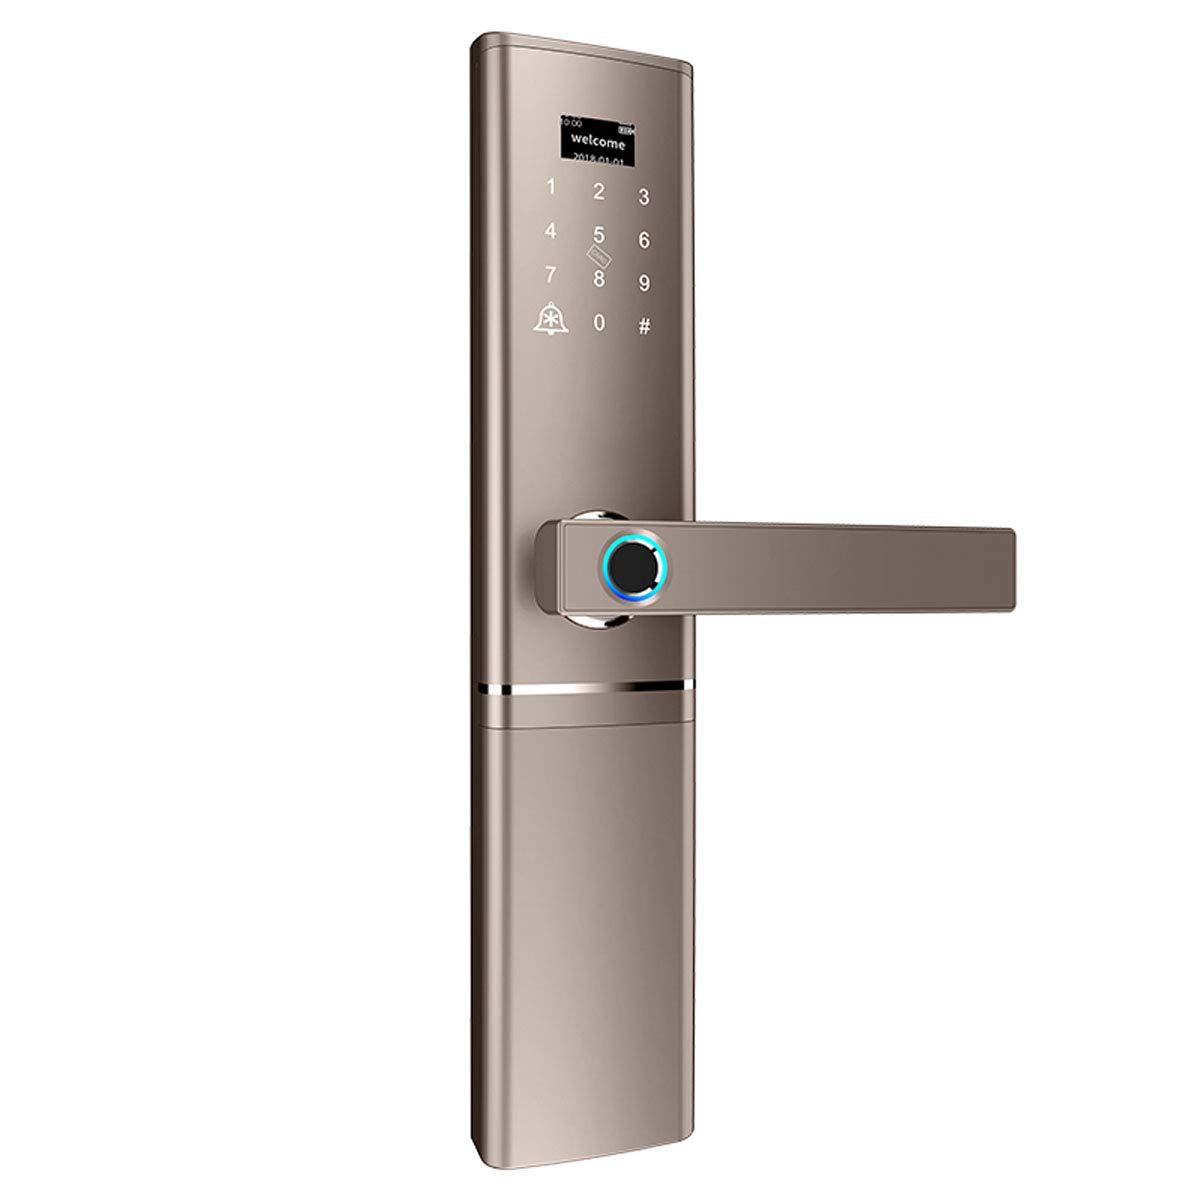 Love of Life Smart Door Locks for Homes Fingerprint Lock Digital Password Lock Support IC Magnetic Card Unlock/Phone APP Remote Unlock,Gold